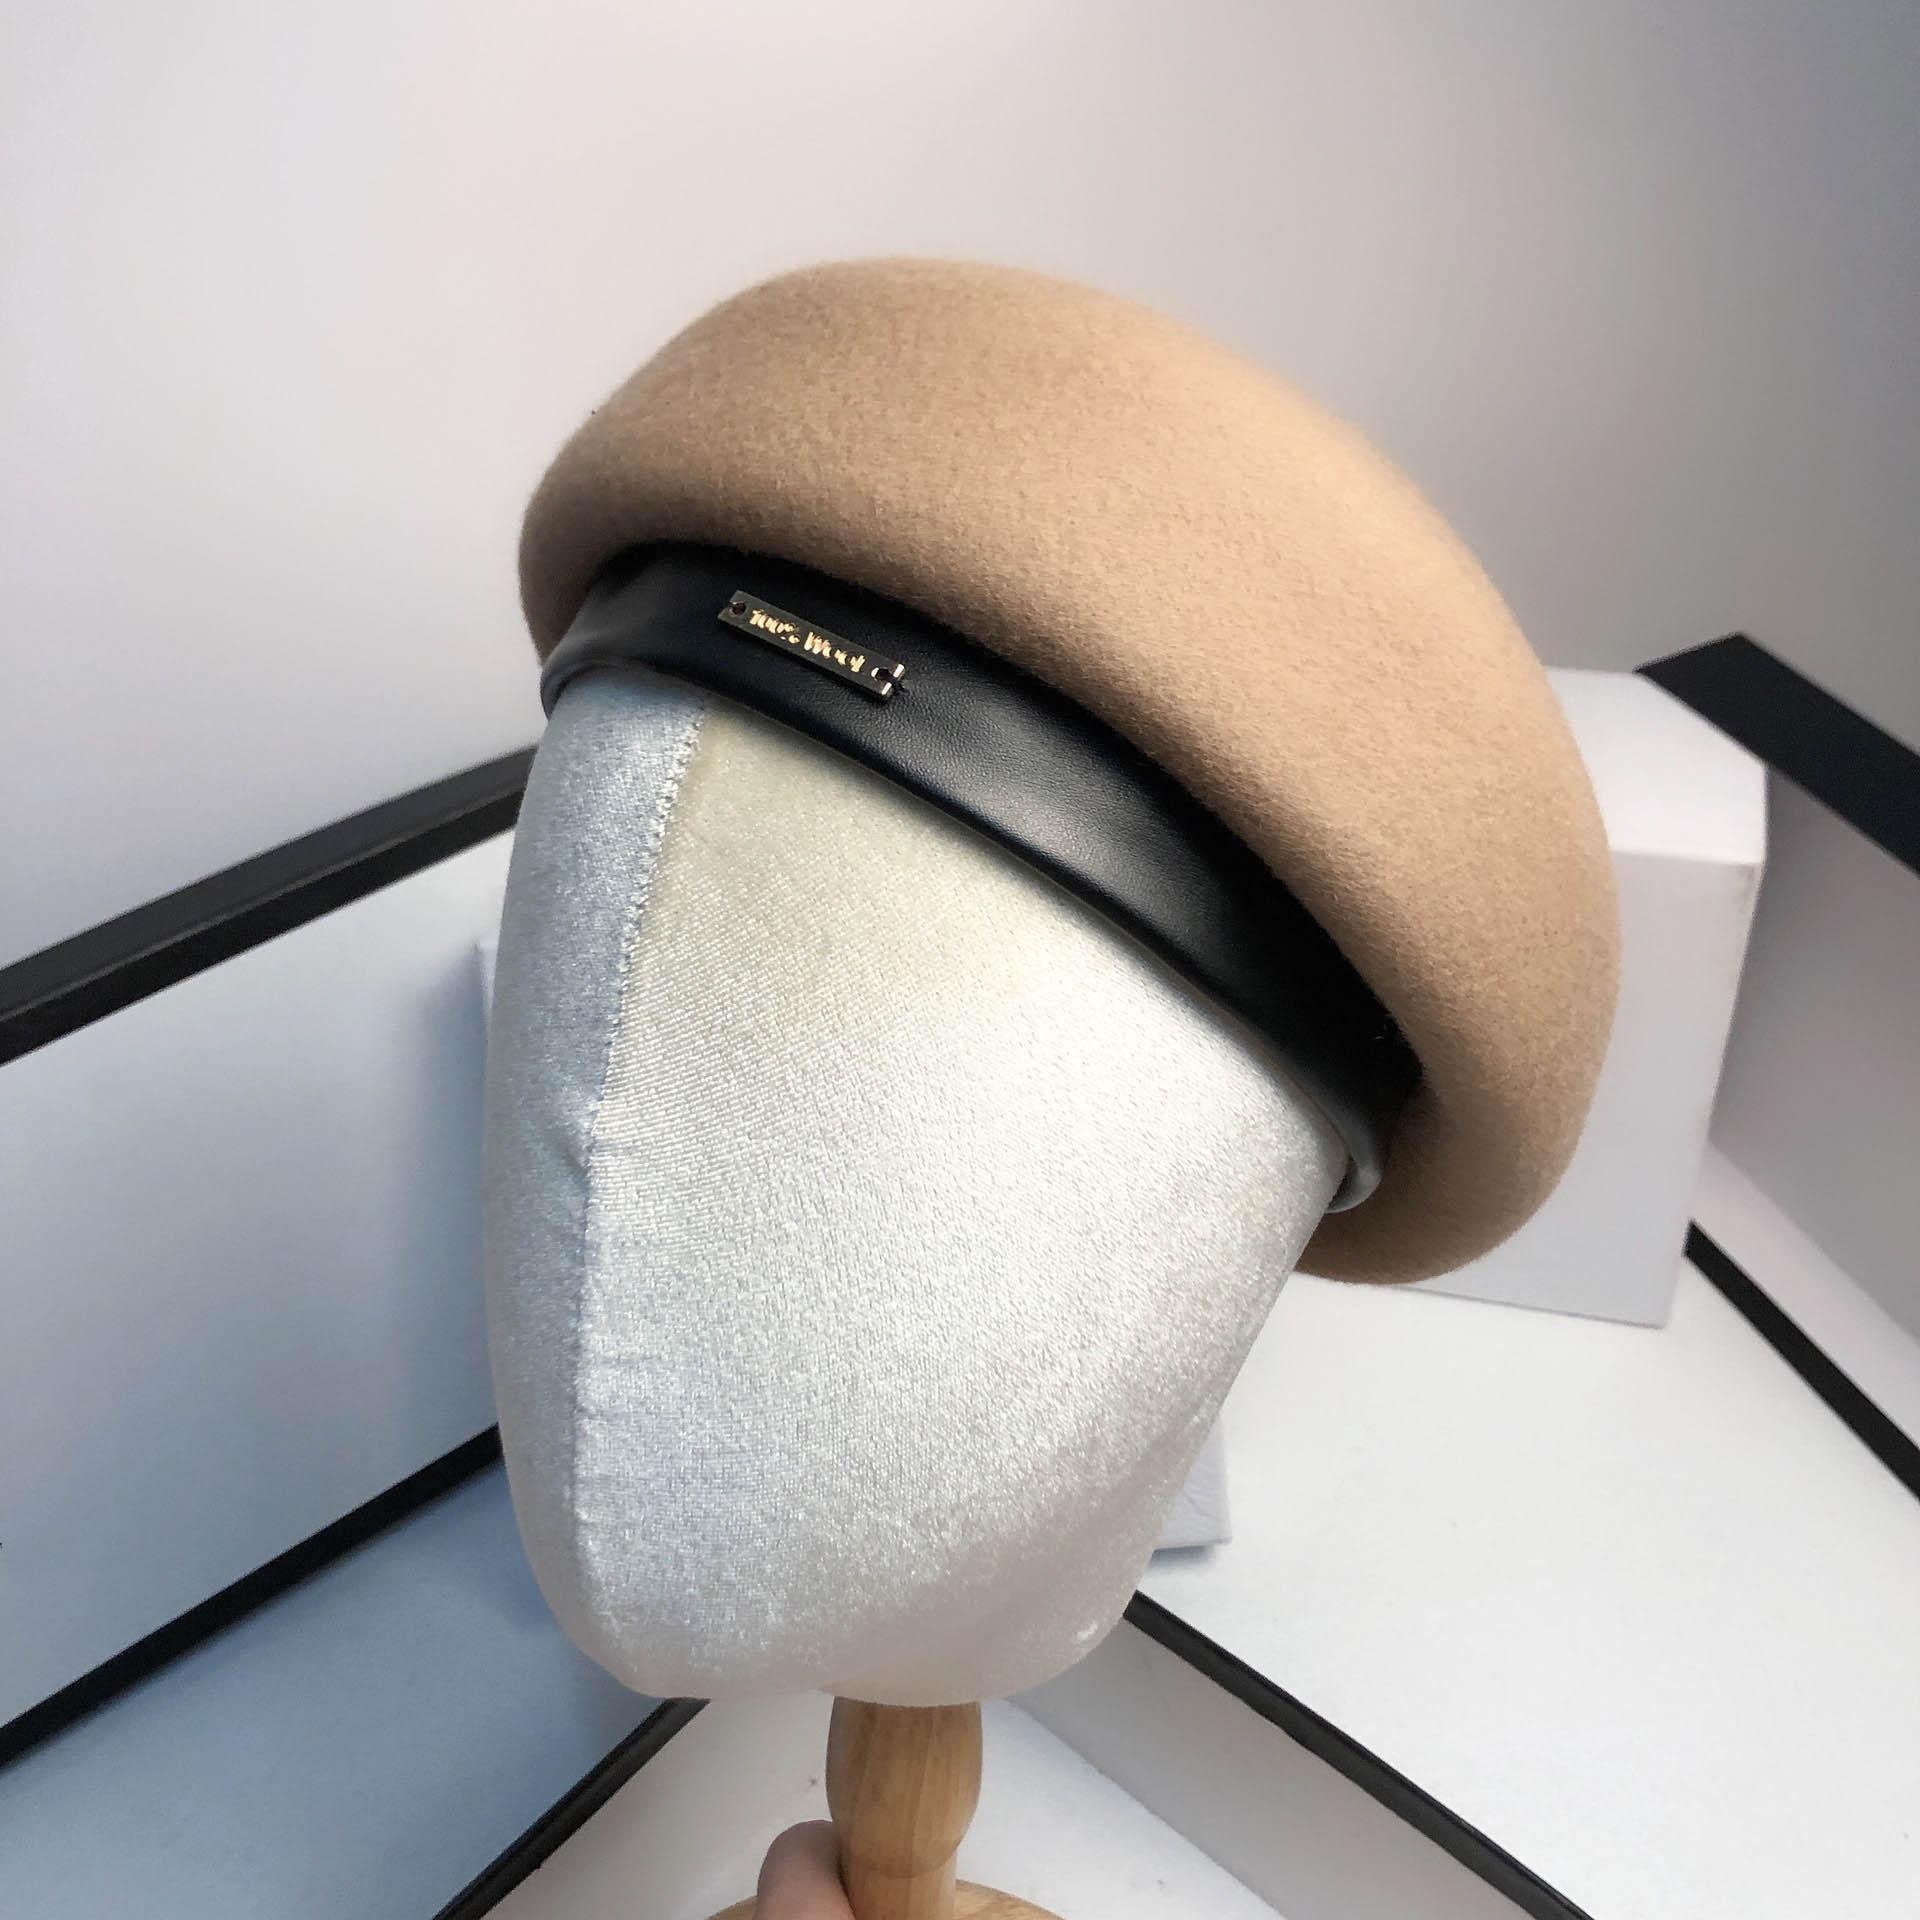 QDKPOTC 2020 Hat Autumn Winter New Women High Quality Wool Stereotype Berets Fashion Ladies Flight Attendant Banquet Fedoras Cap